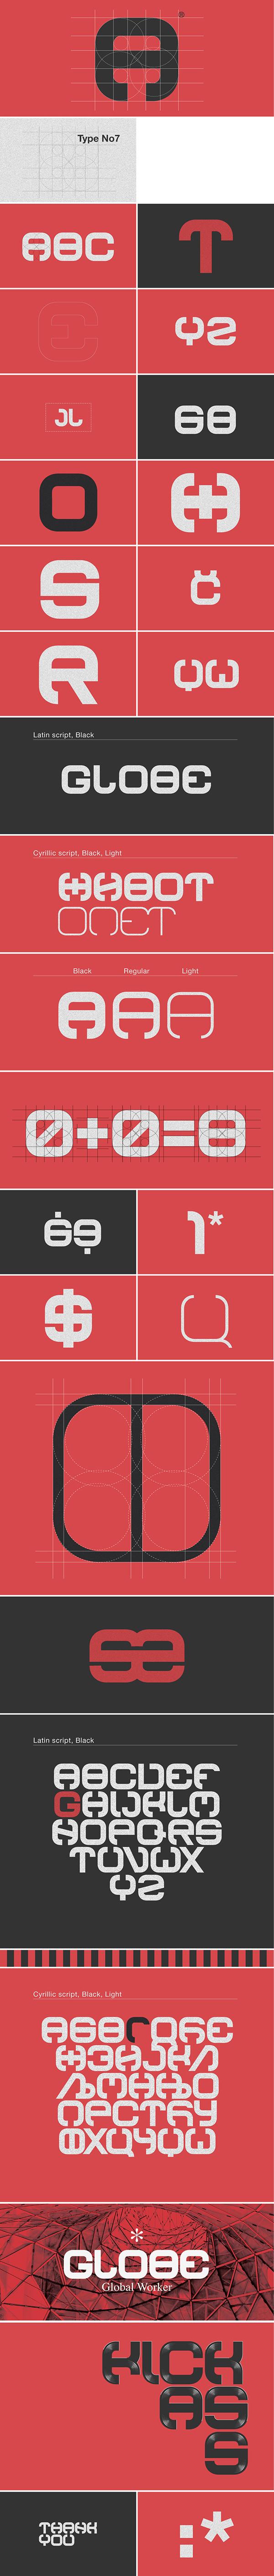 font tipeface industrial design typo Script red black gray graphic modern Global Latin alphabet Cyrillic